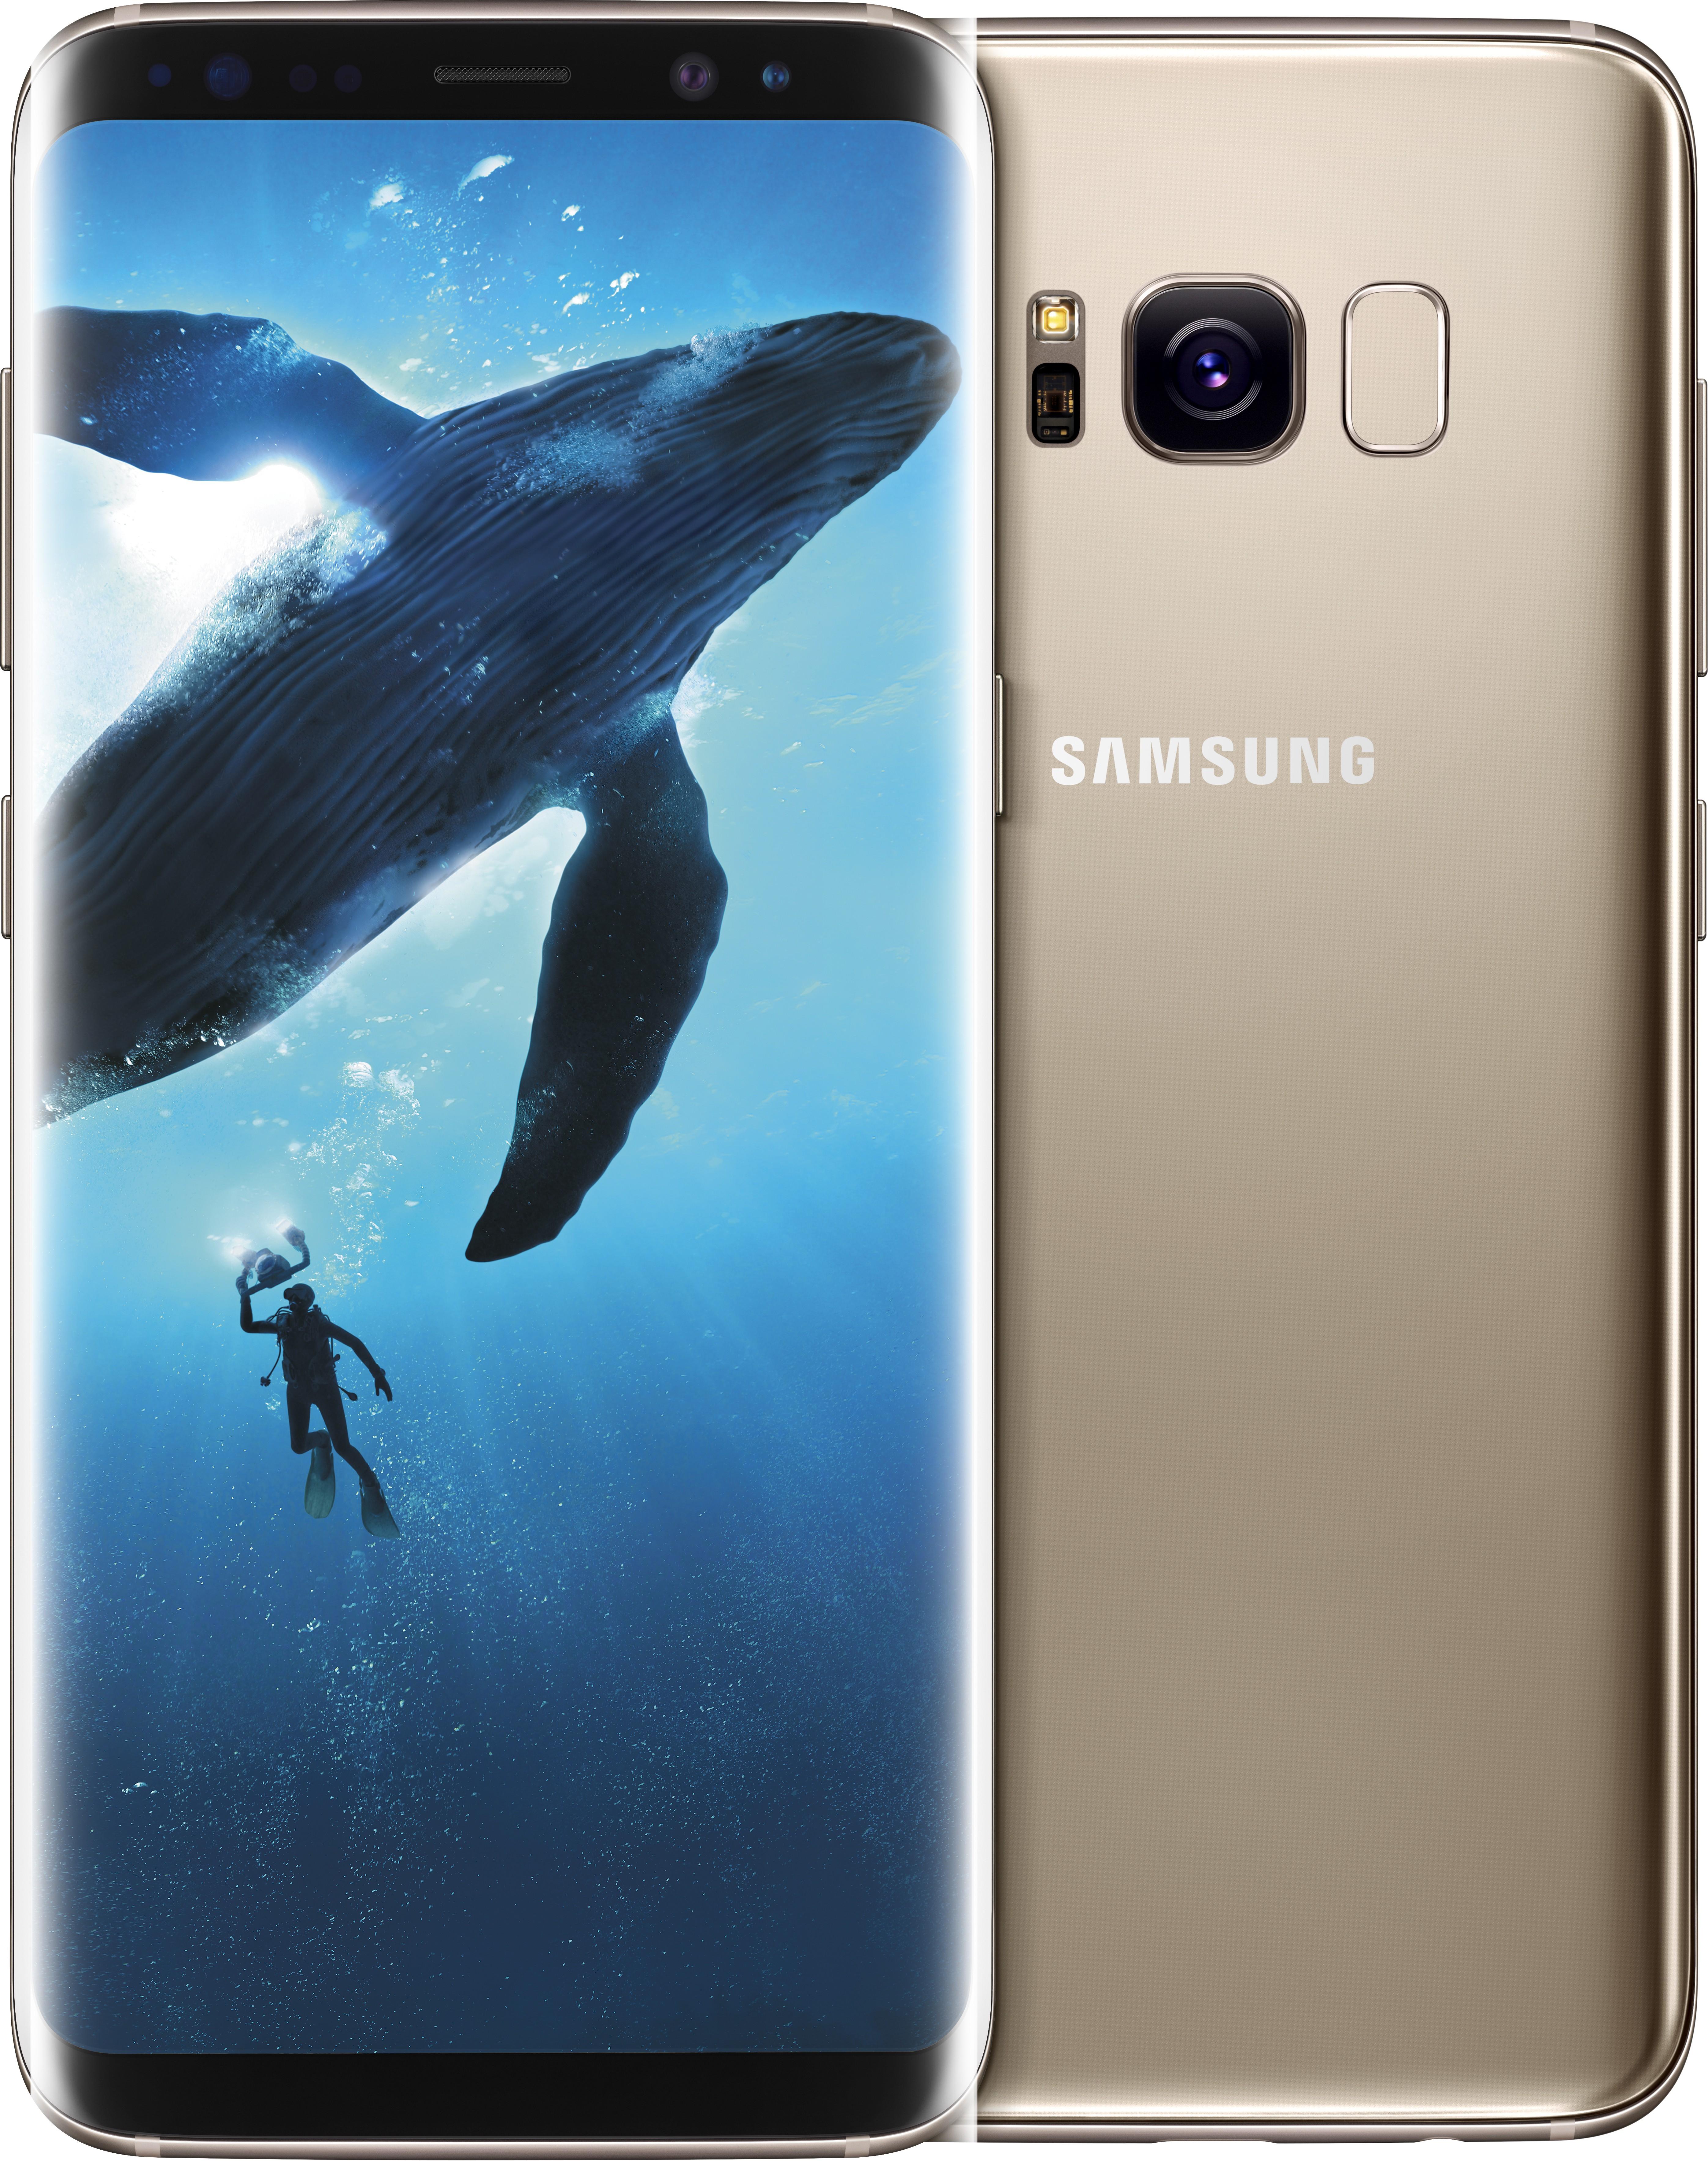 Samsung Galaxy S8 (Maple Gold, 64 GB)(4 GB RAM) image